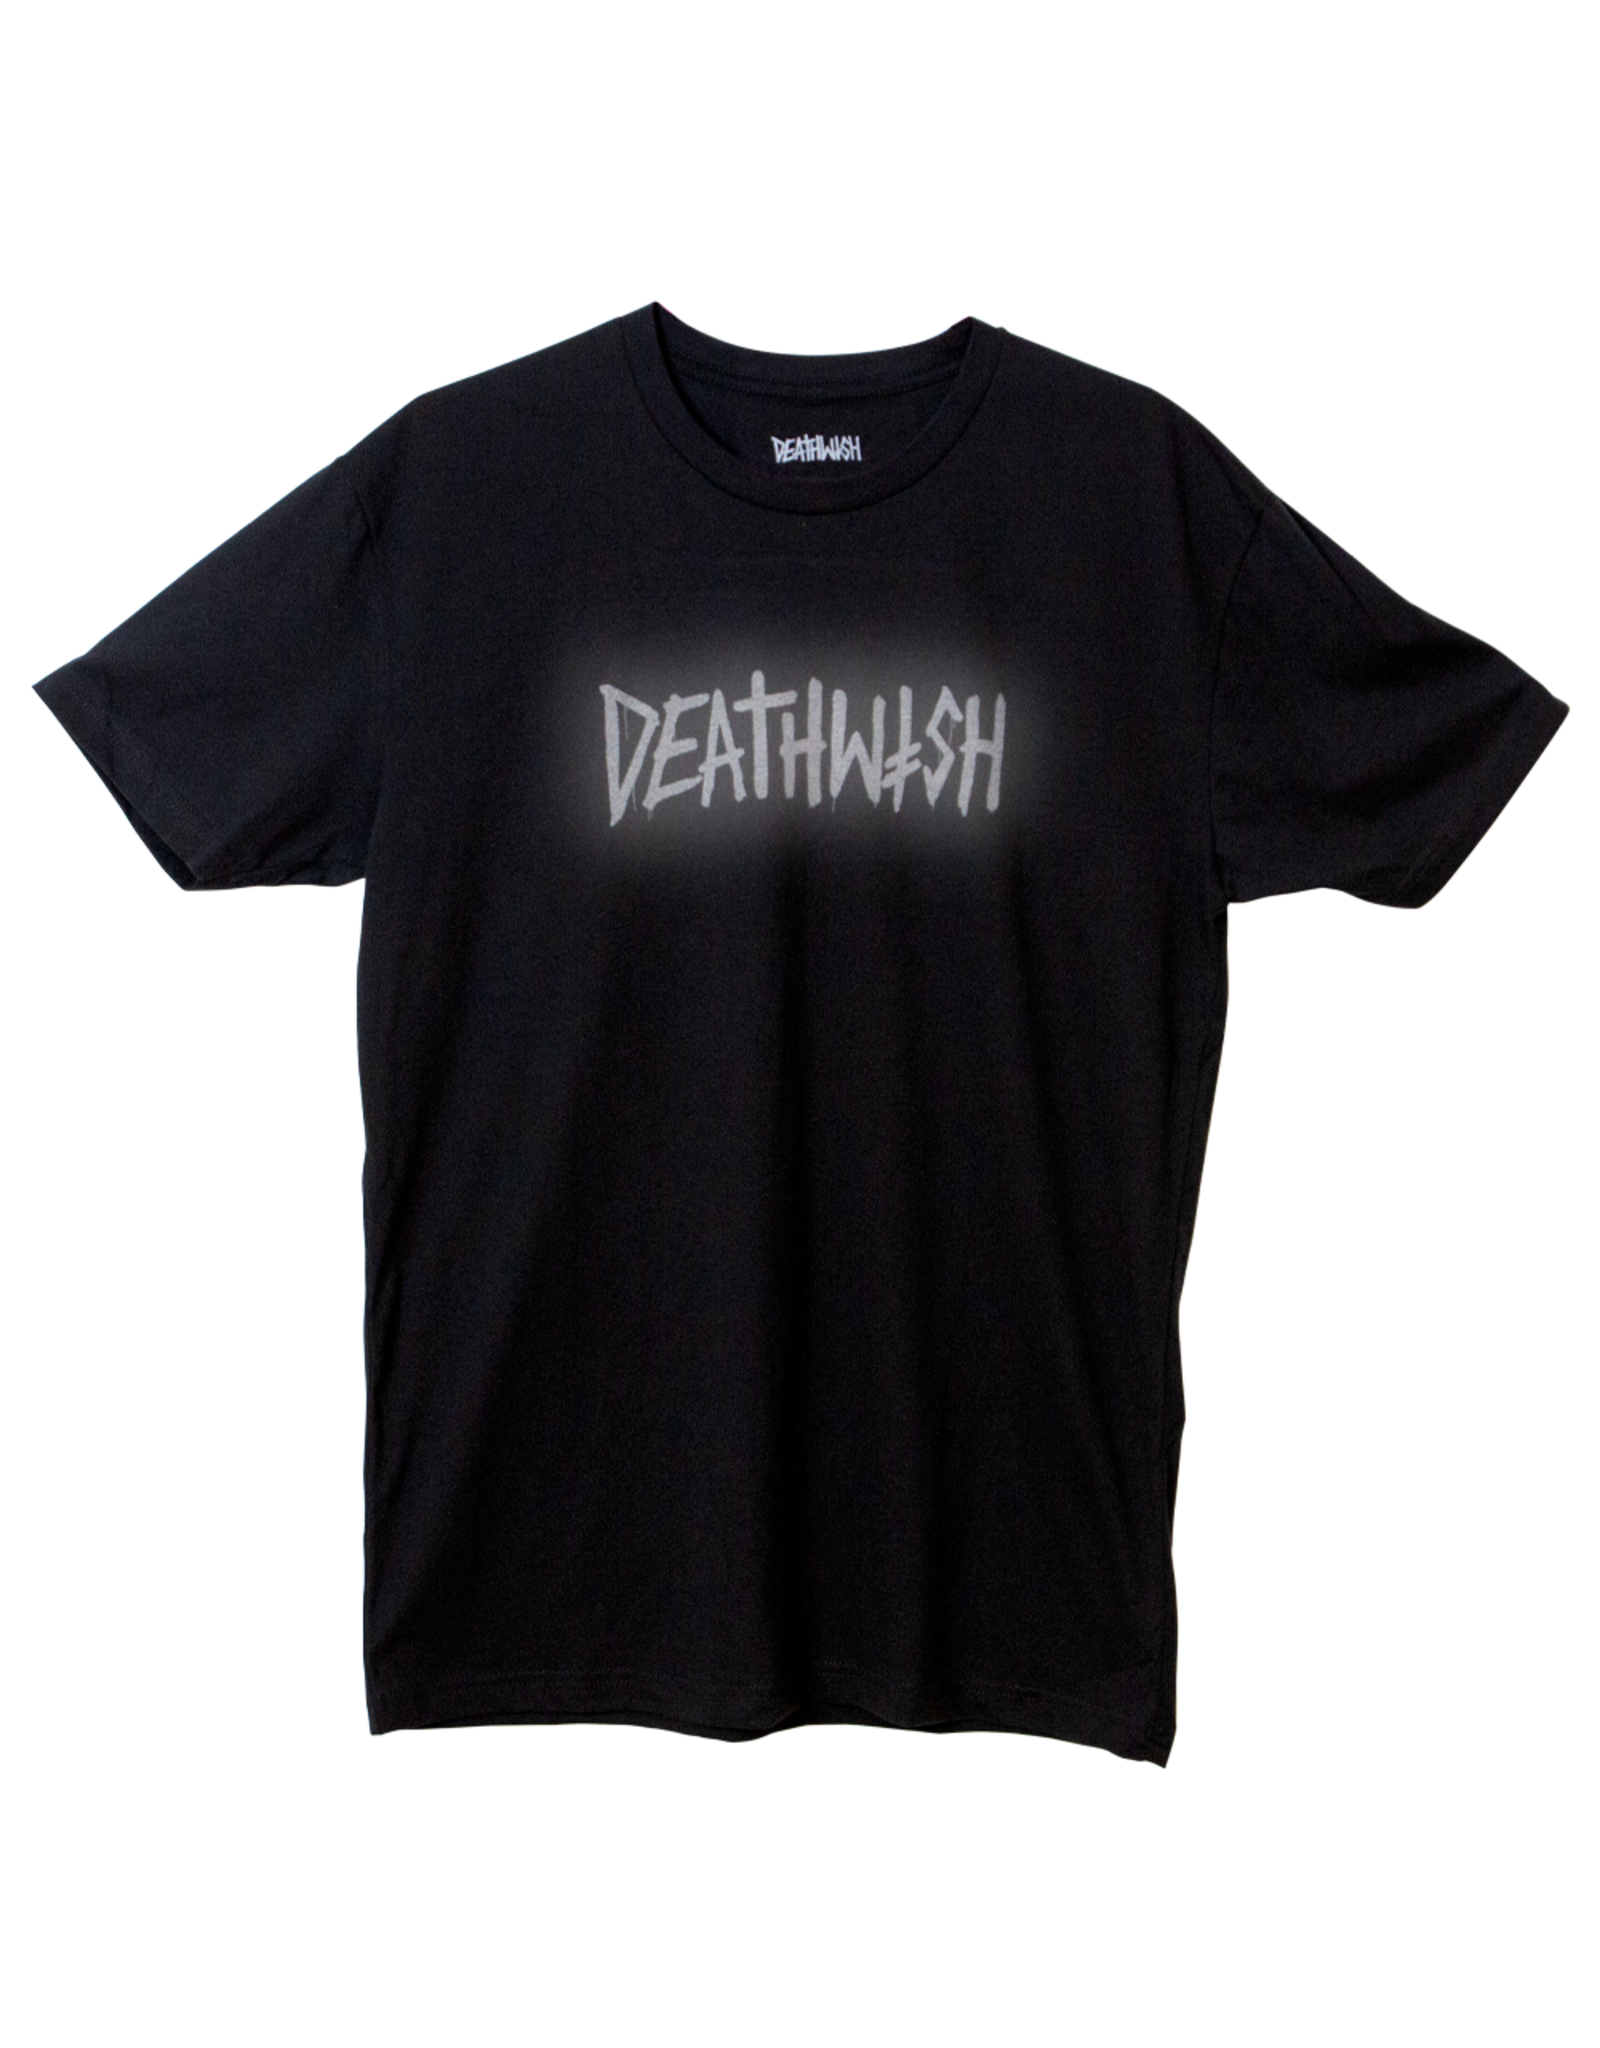 DEATHWISH DEATHWISH - DEATHTAG S/S - BLACK/SILVER